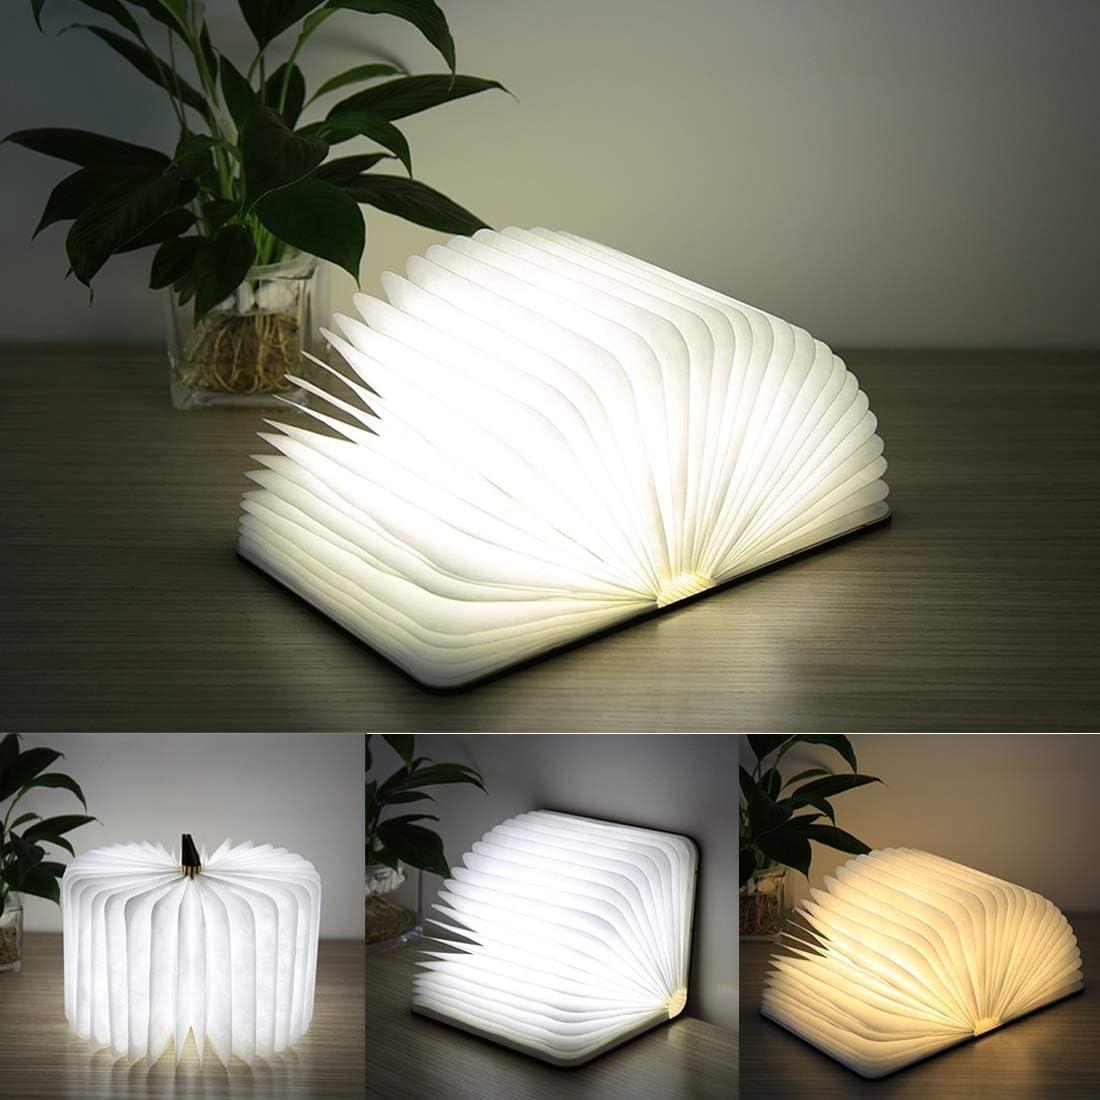 Creative LED Flip Sales Origami 5 popular Book Warm Ligh Lamp White Nightlights